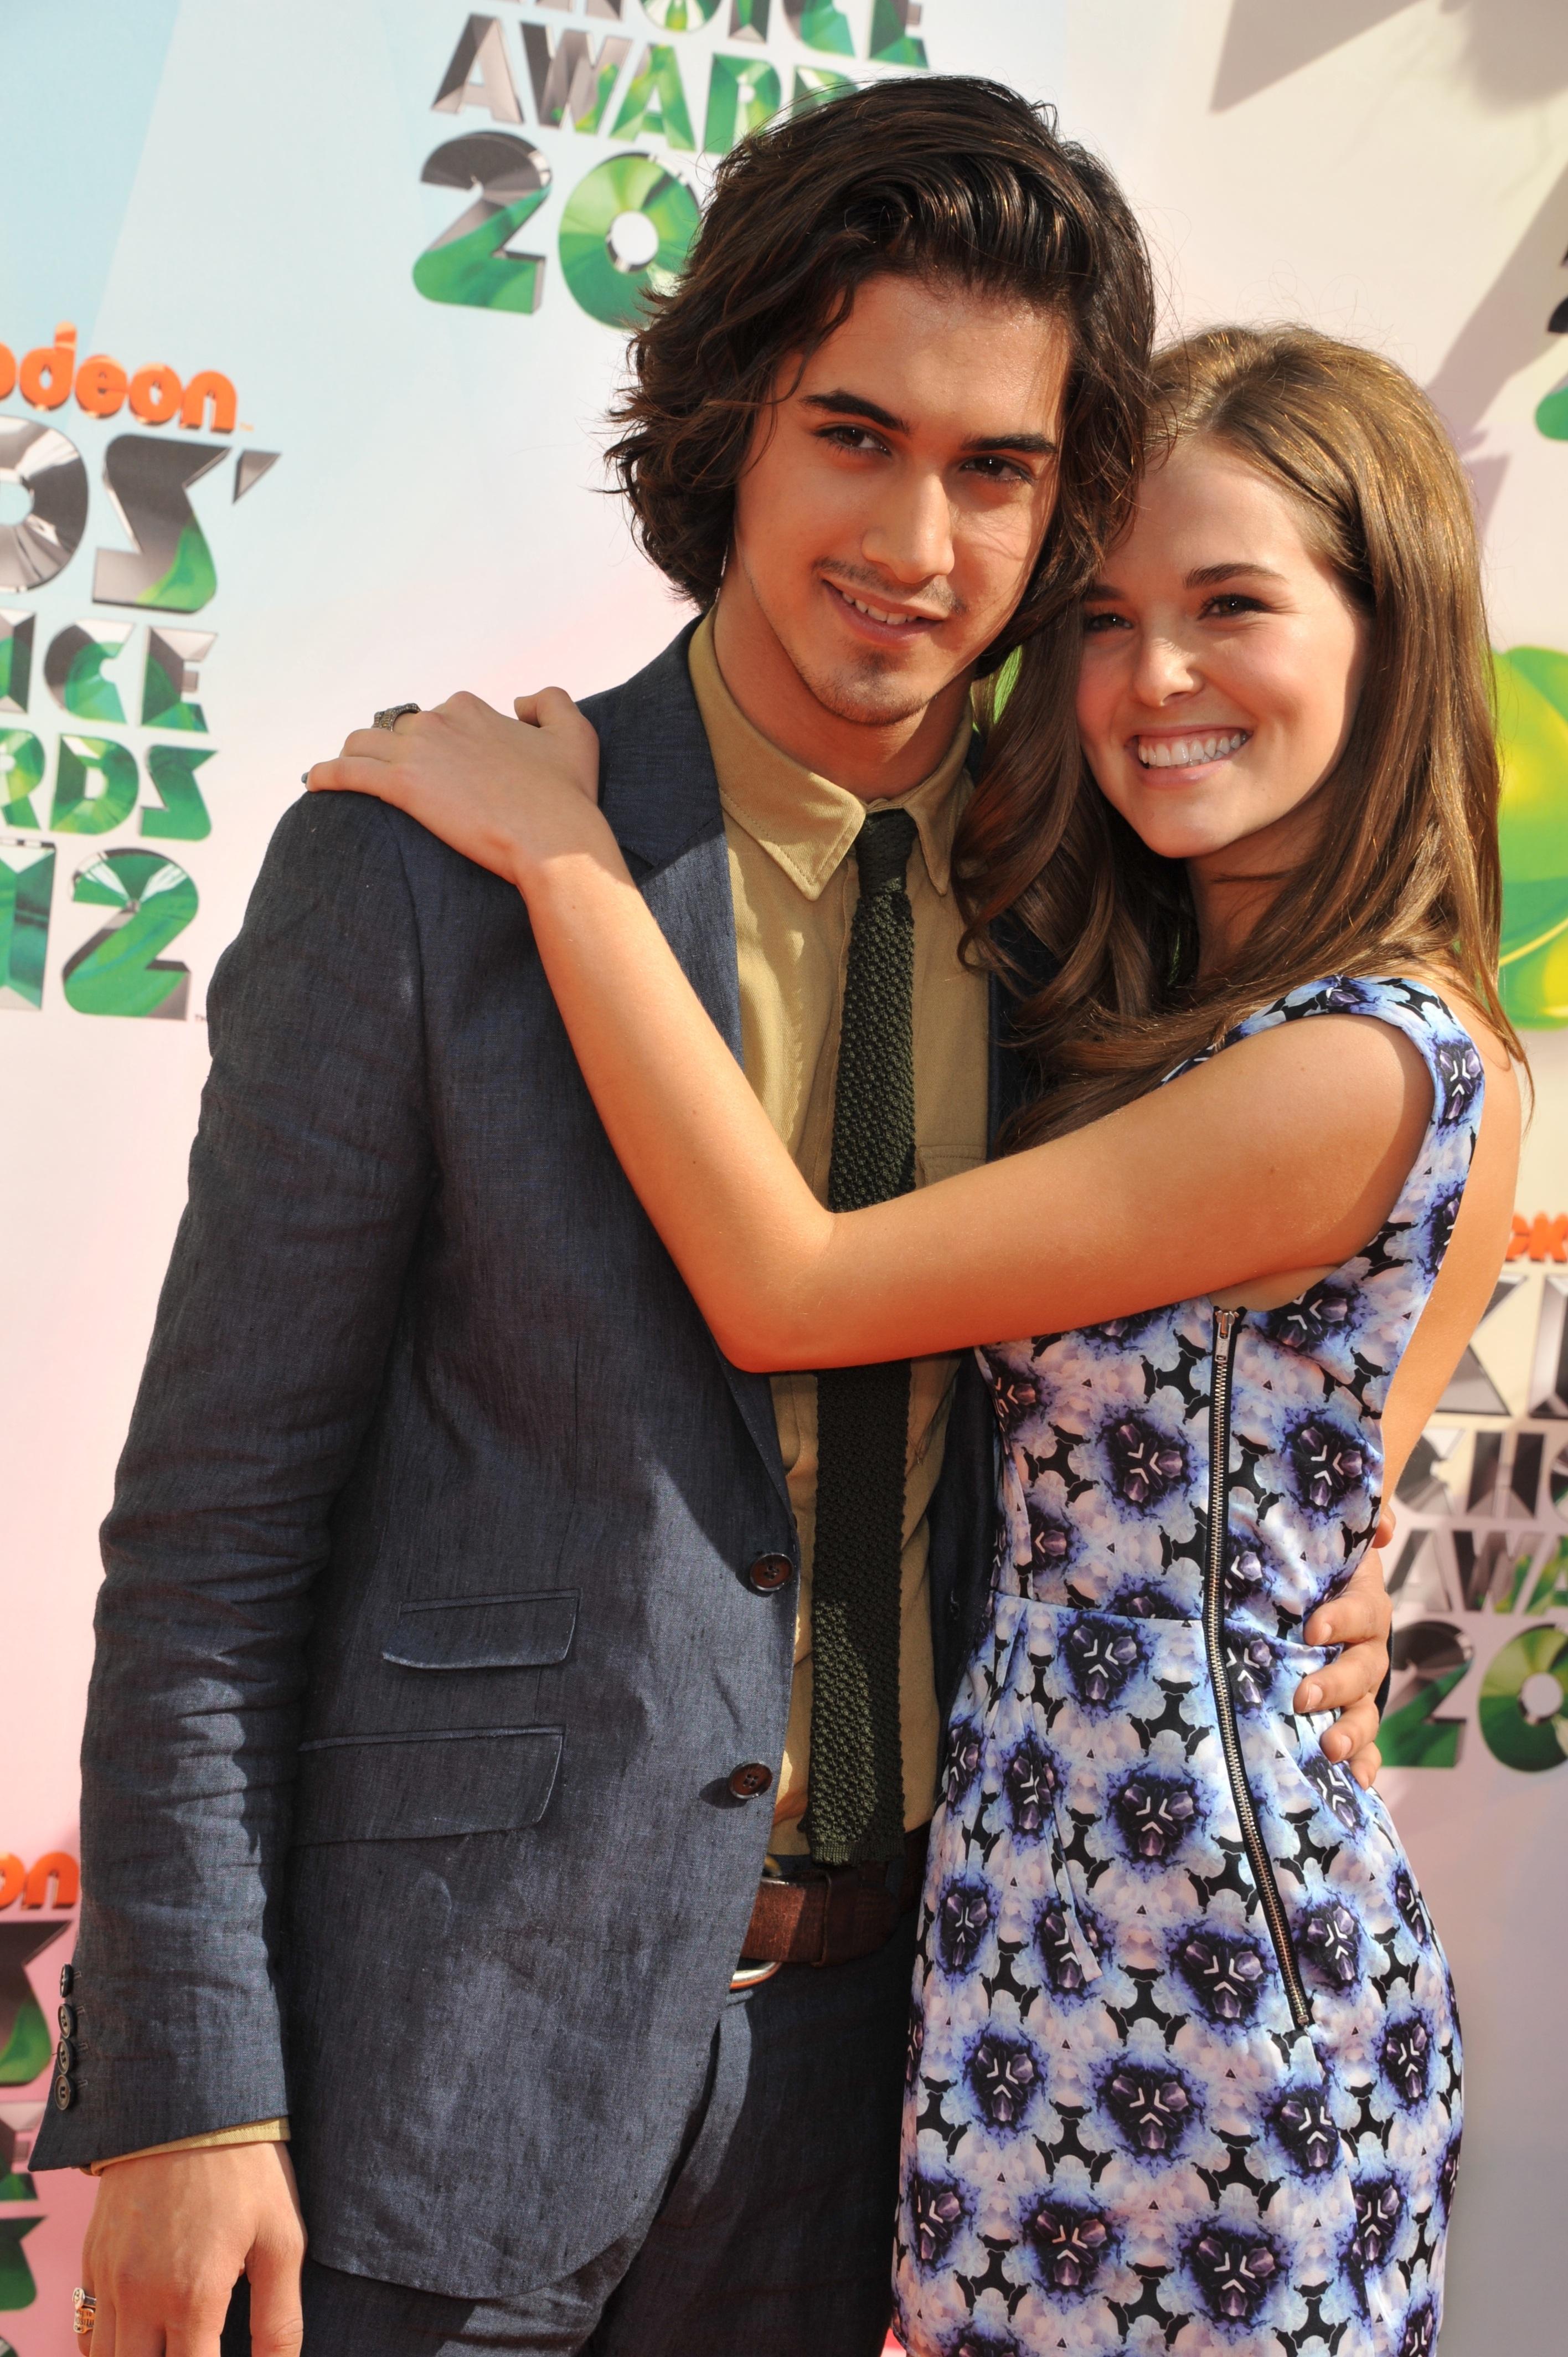 358315718_CFF_Zoey_Deutch_Nickelodeons_25th_Annual_Kids_Choice_Awards_In_LA_March_31_2012_014_122_501lo.jpg